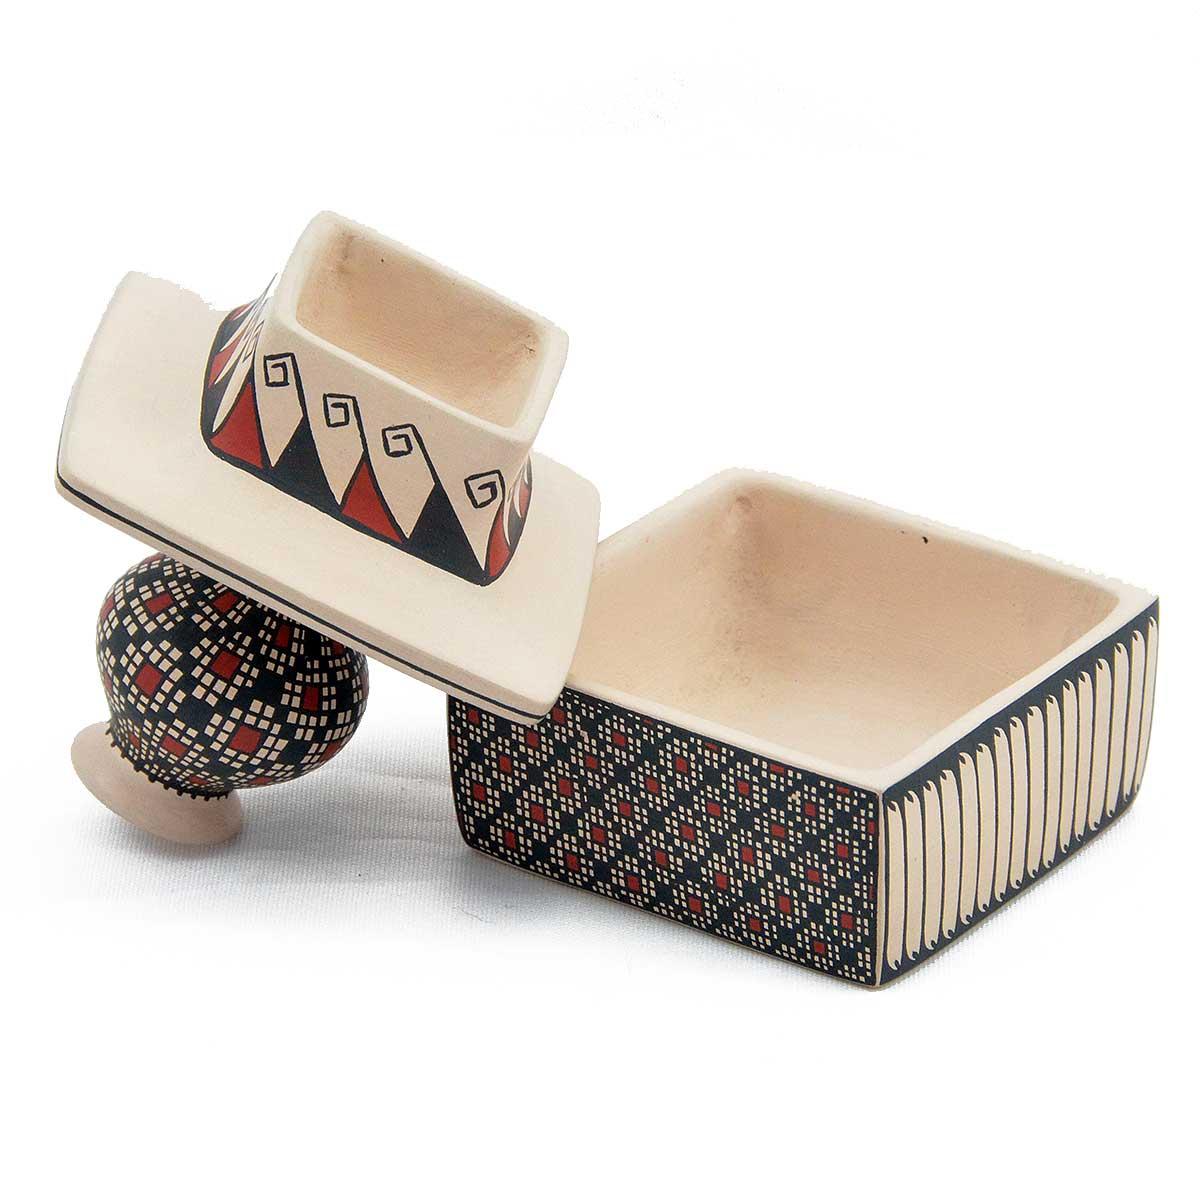 Miriham Gallegos Miriham Gallegos: Small Square Box Fine Geometric Geometric